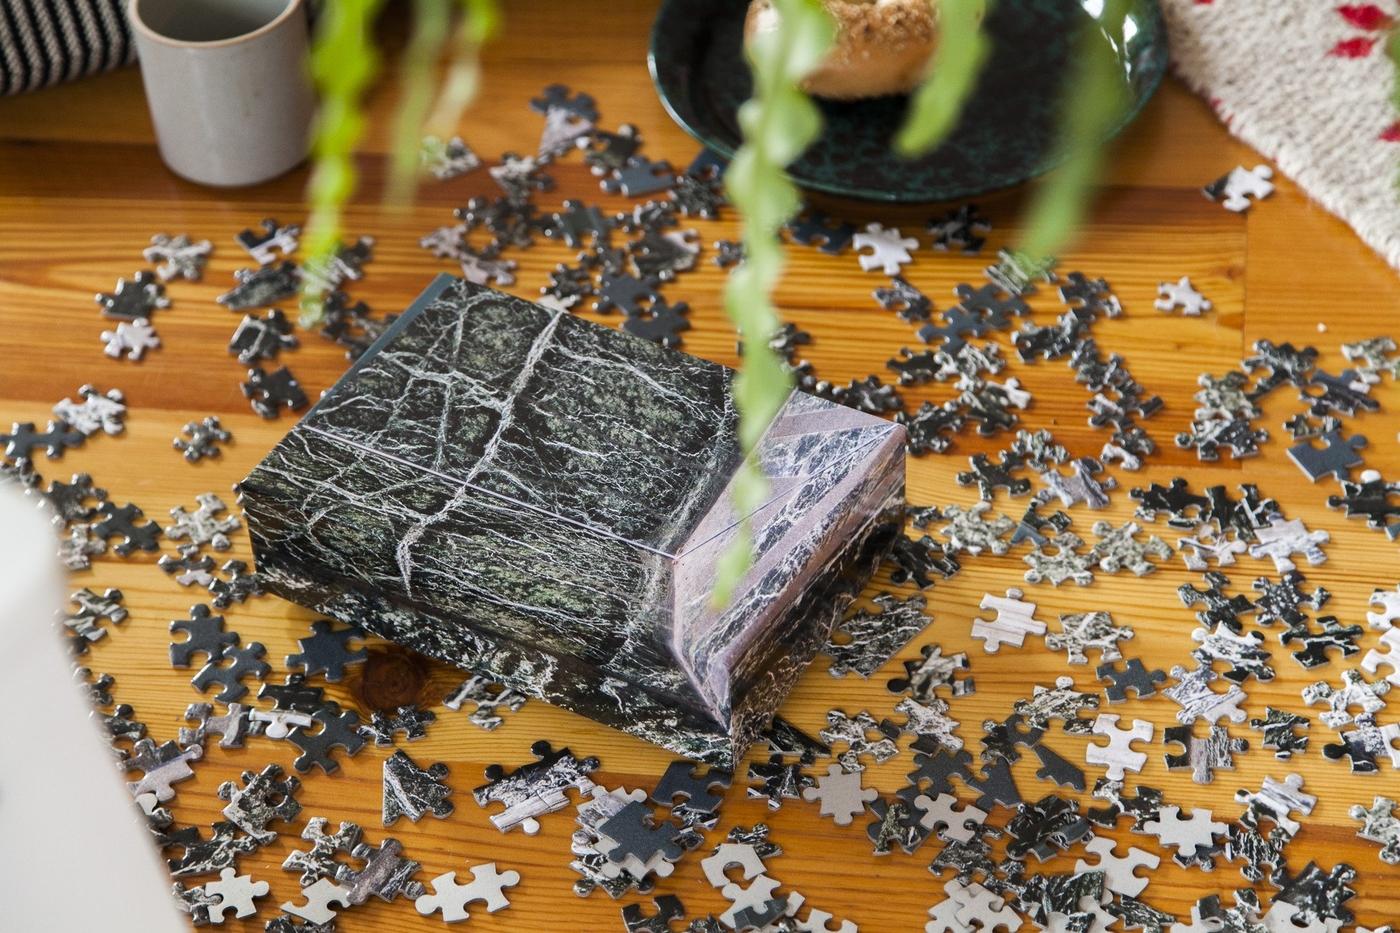 PuzzleInPuzzle-marble-lifestyle-04-17S-KKPPMA_2048x2048.jpg